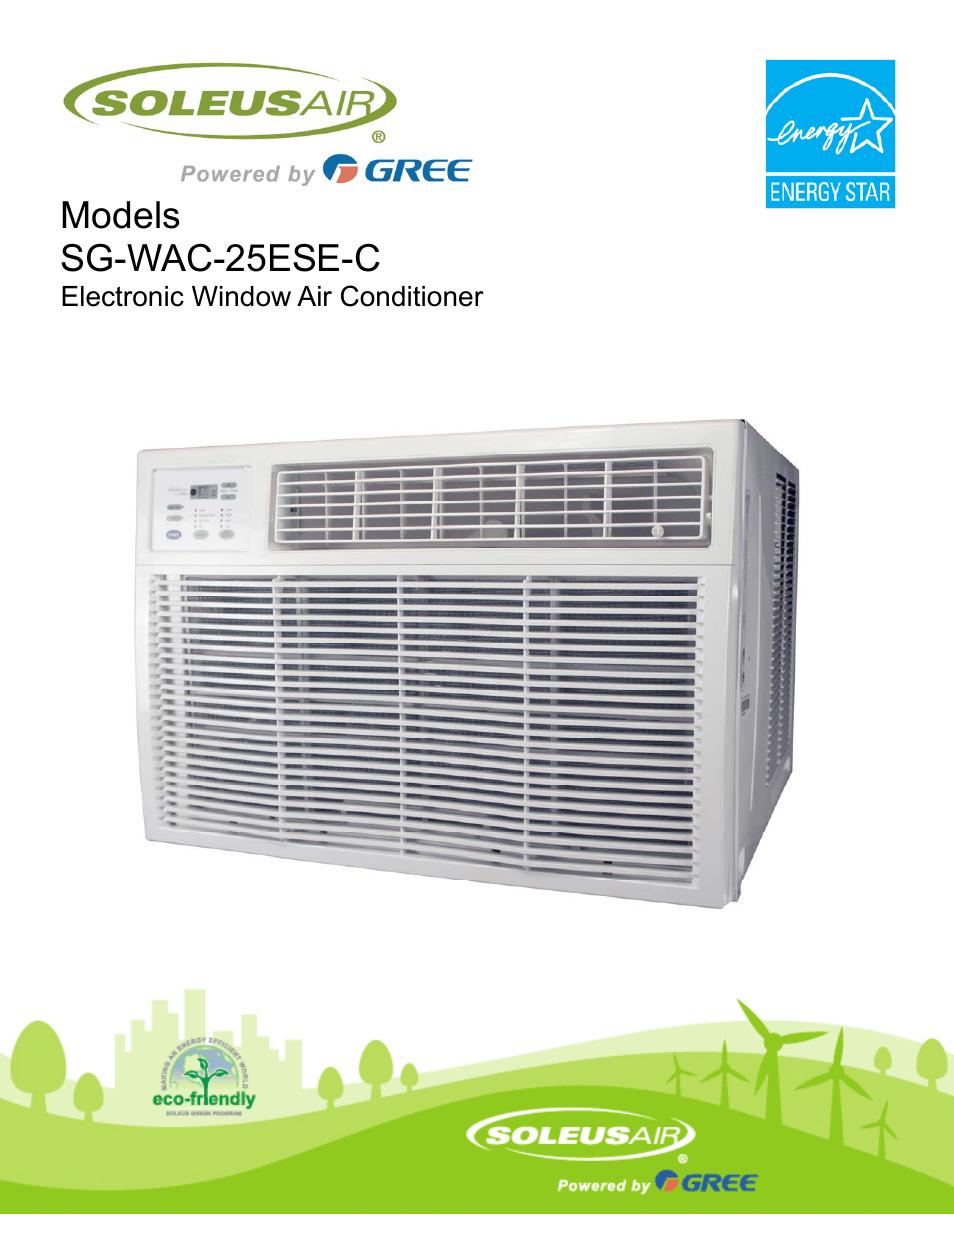 Soleus Air Electronic Window Air Conditioner Sg Wac 25ese